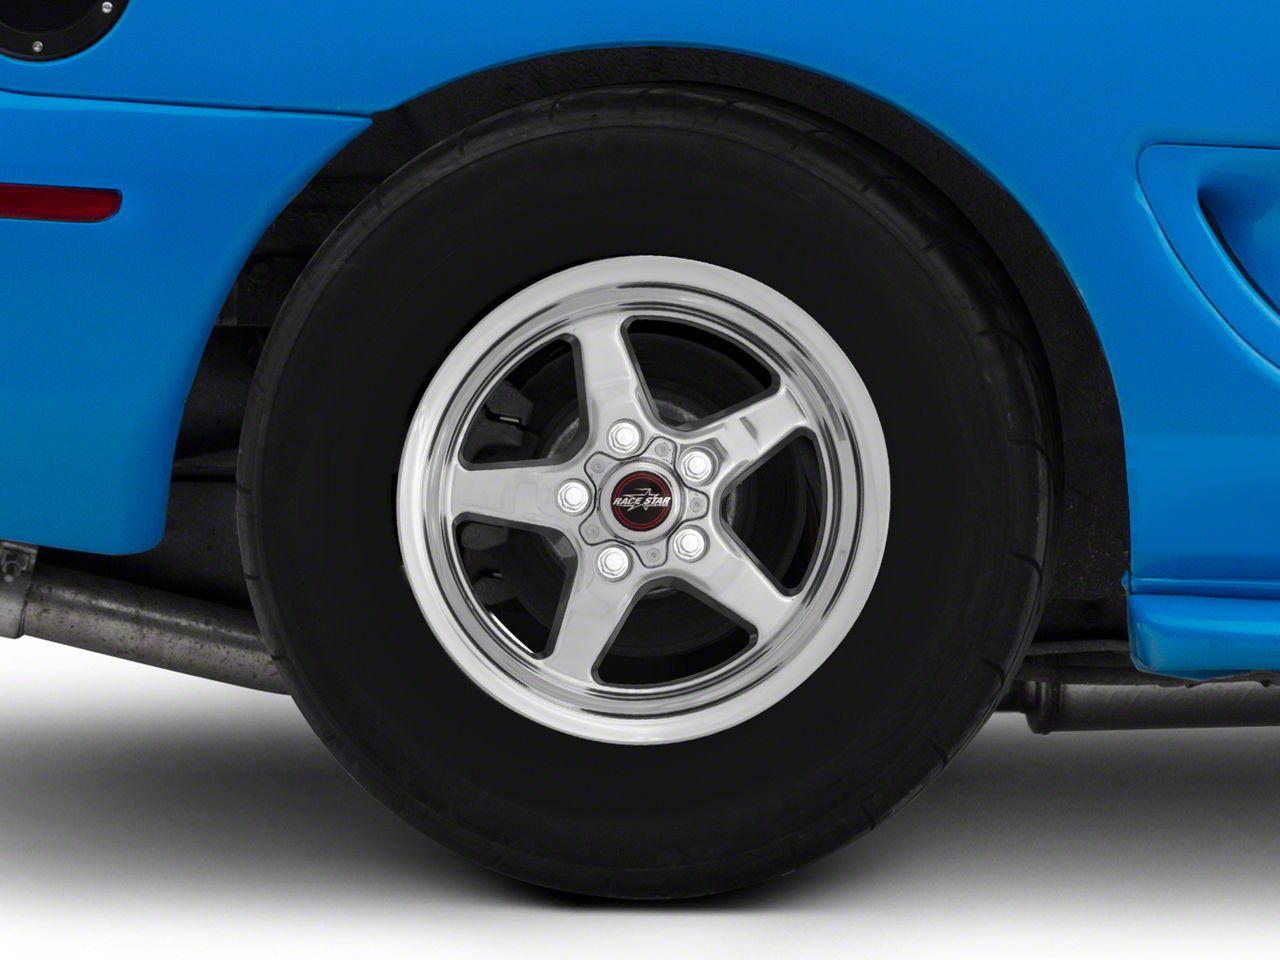 Race Star Drag Wheel - Direct Drill - 15x10 - Rear Only (94-04 GT, V6)